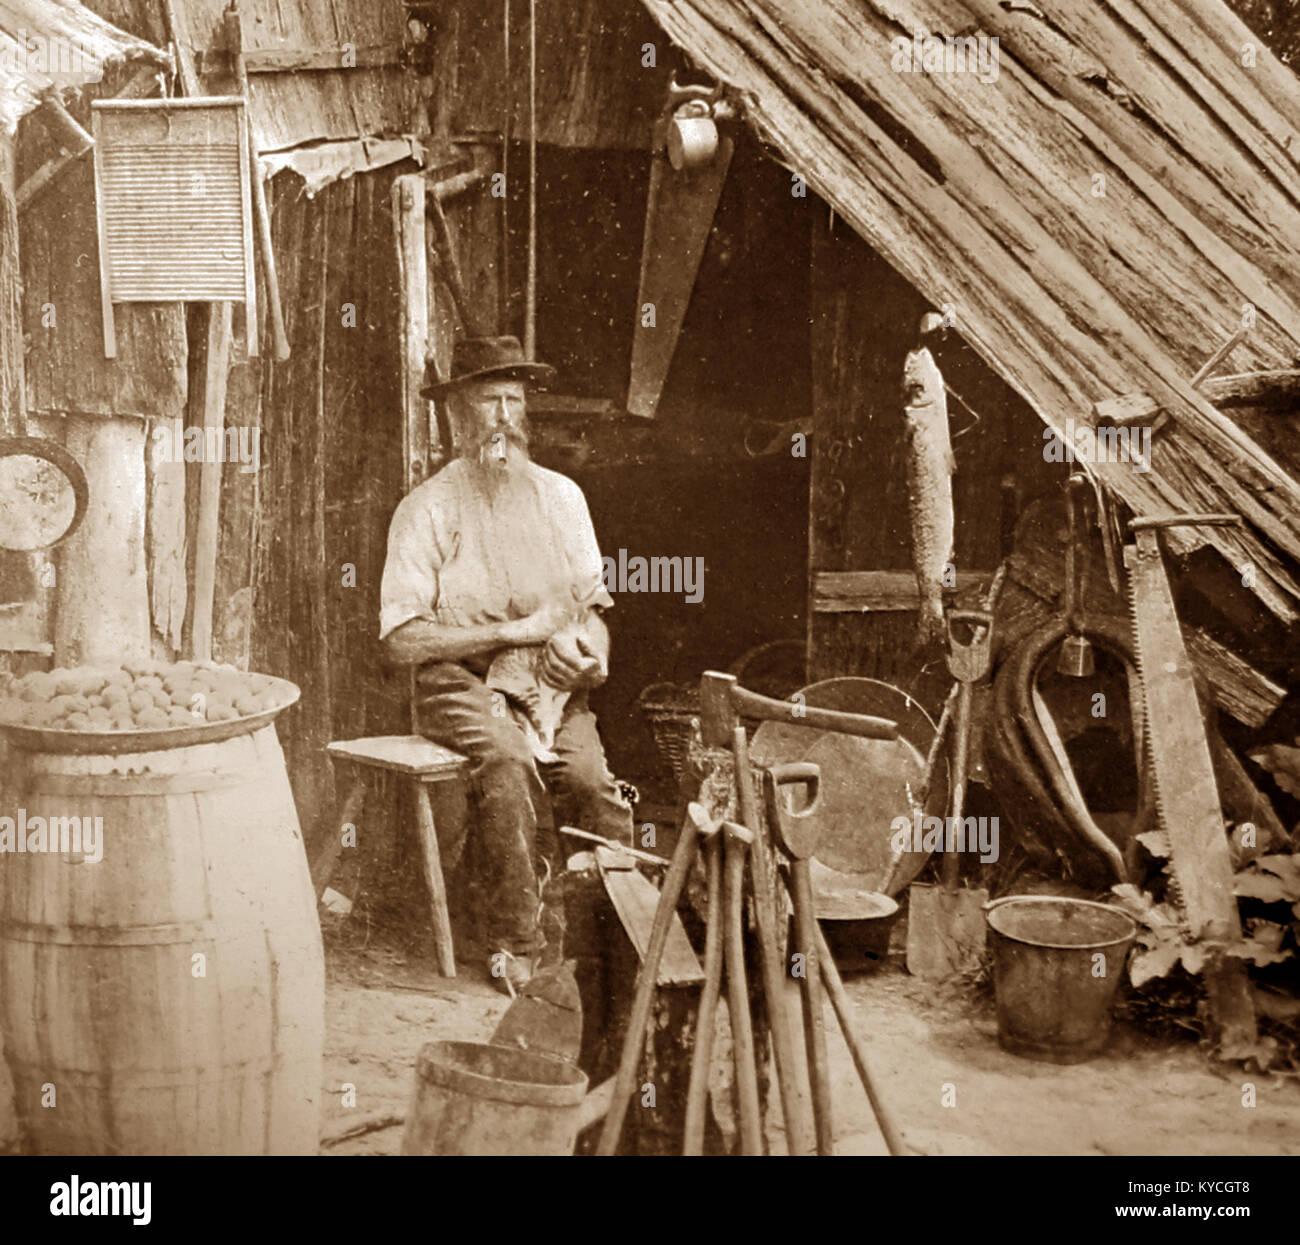 A settler in Gippsland, Victoria, Australia, Victorian period - Stock Image